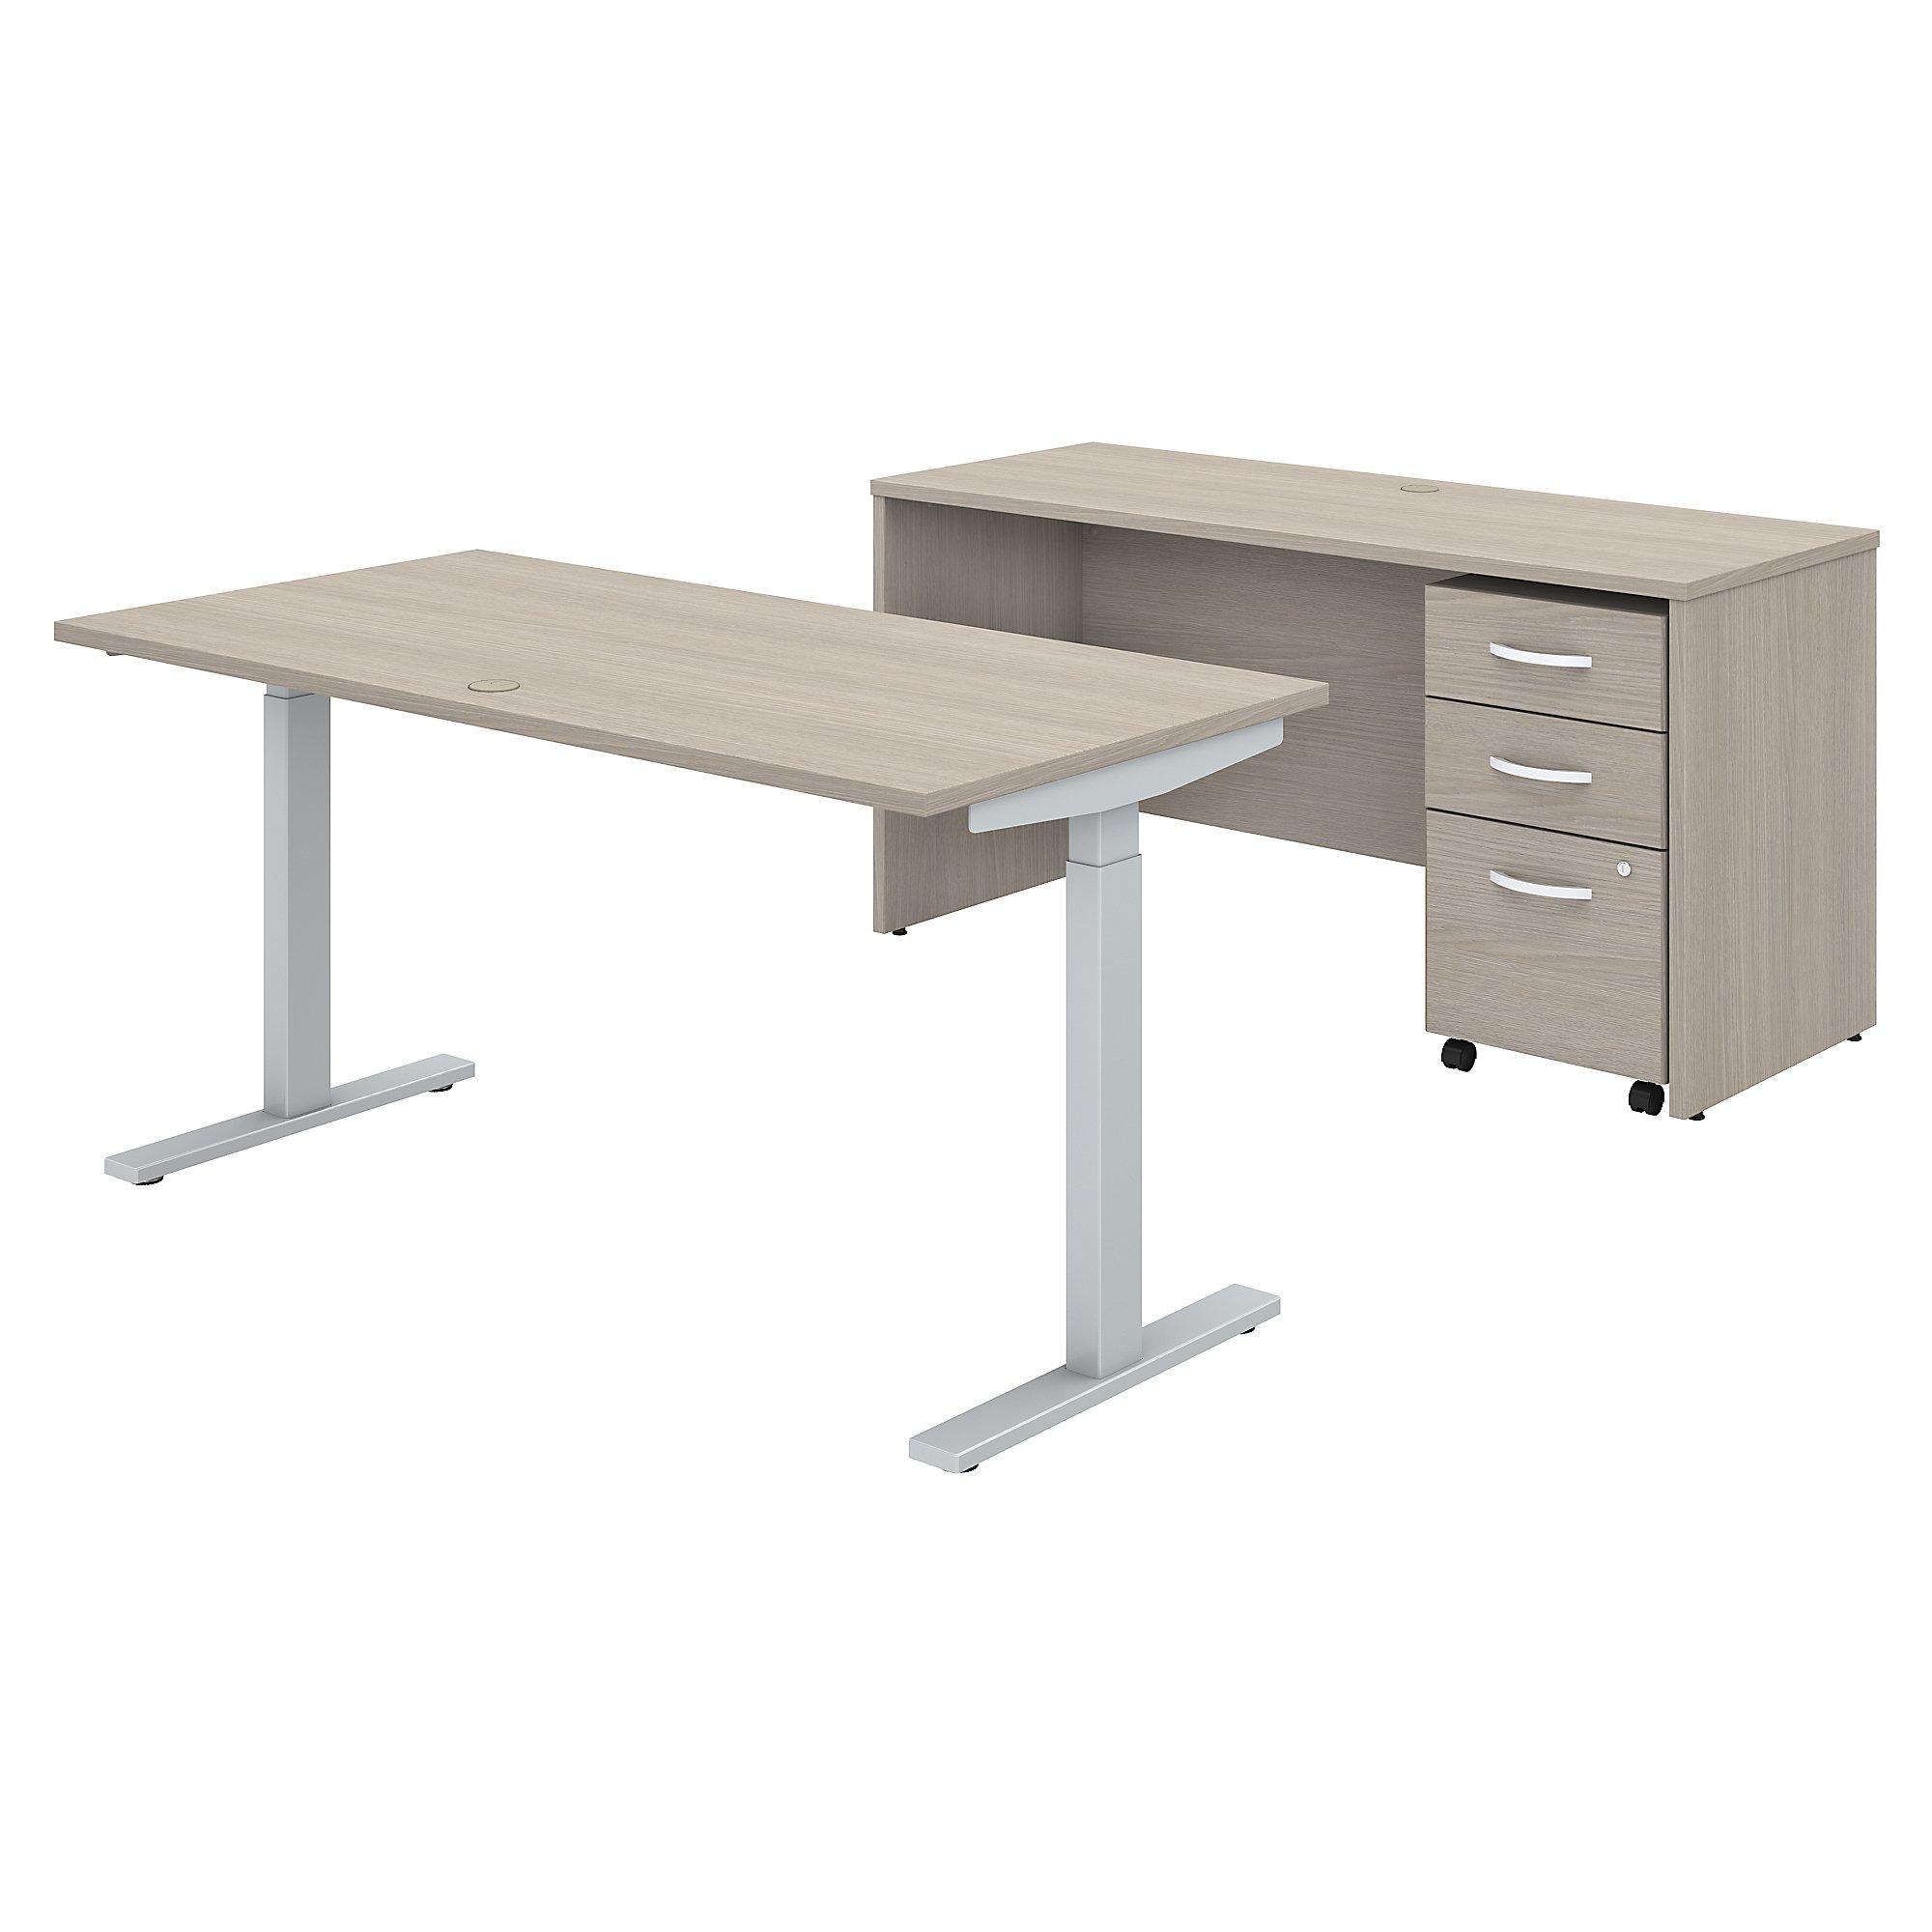 Bush Business Furniture Studio C Contemporary Sit To Stand Ergonomic Furniture Set